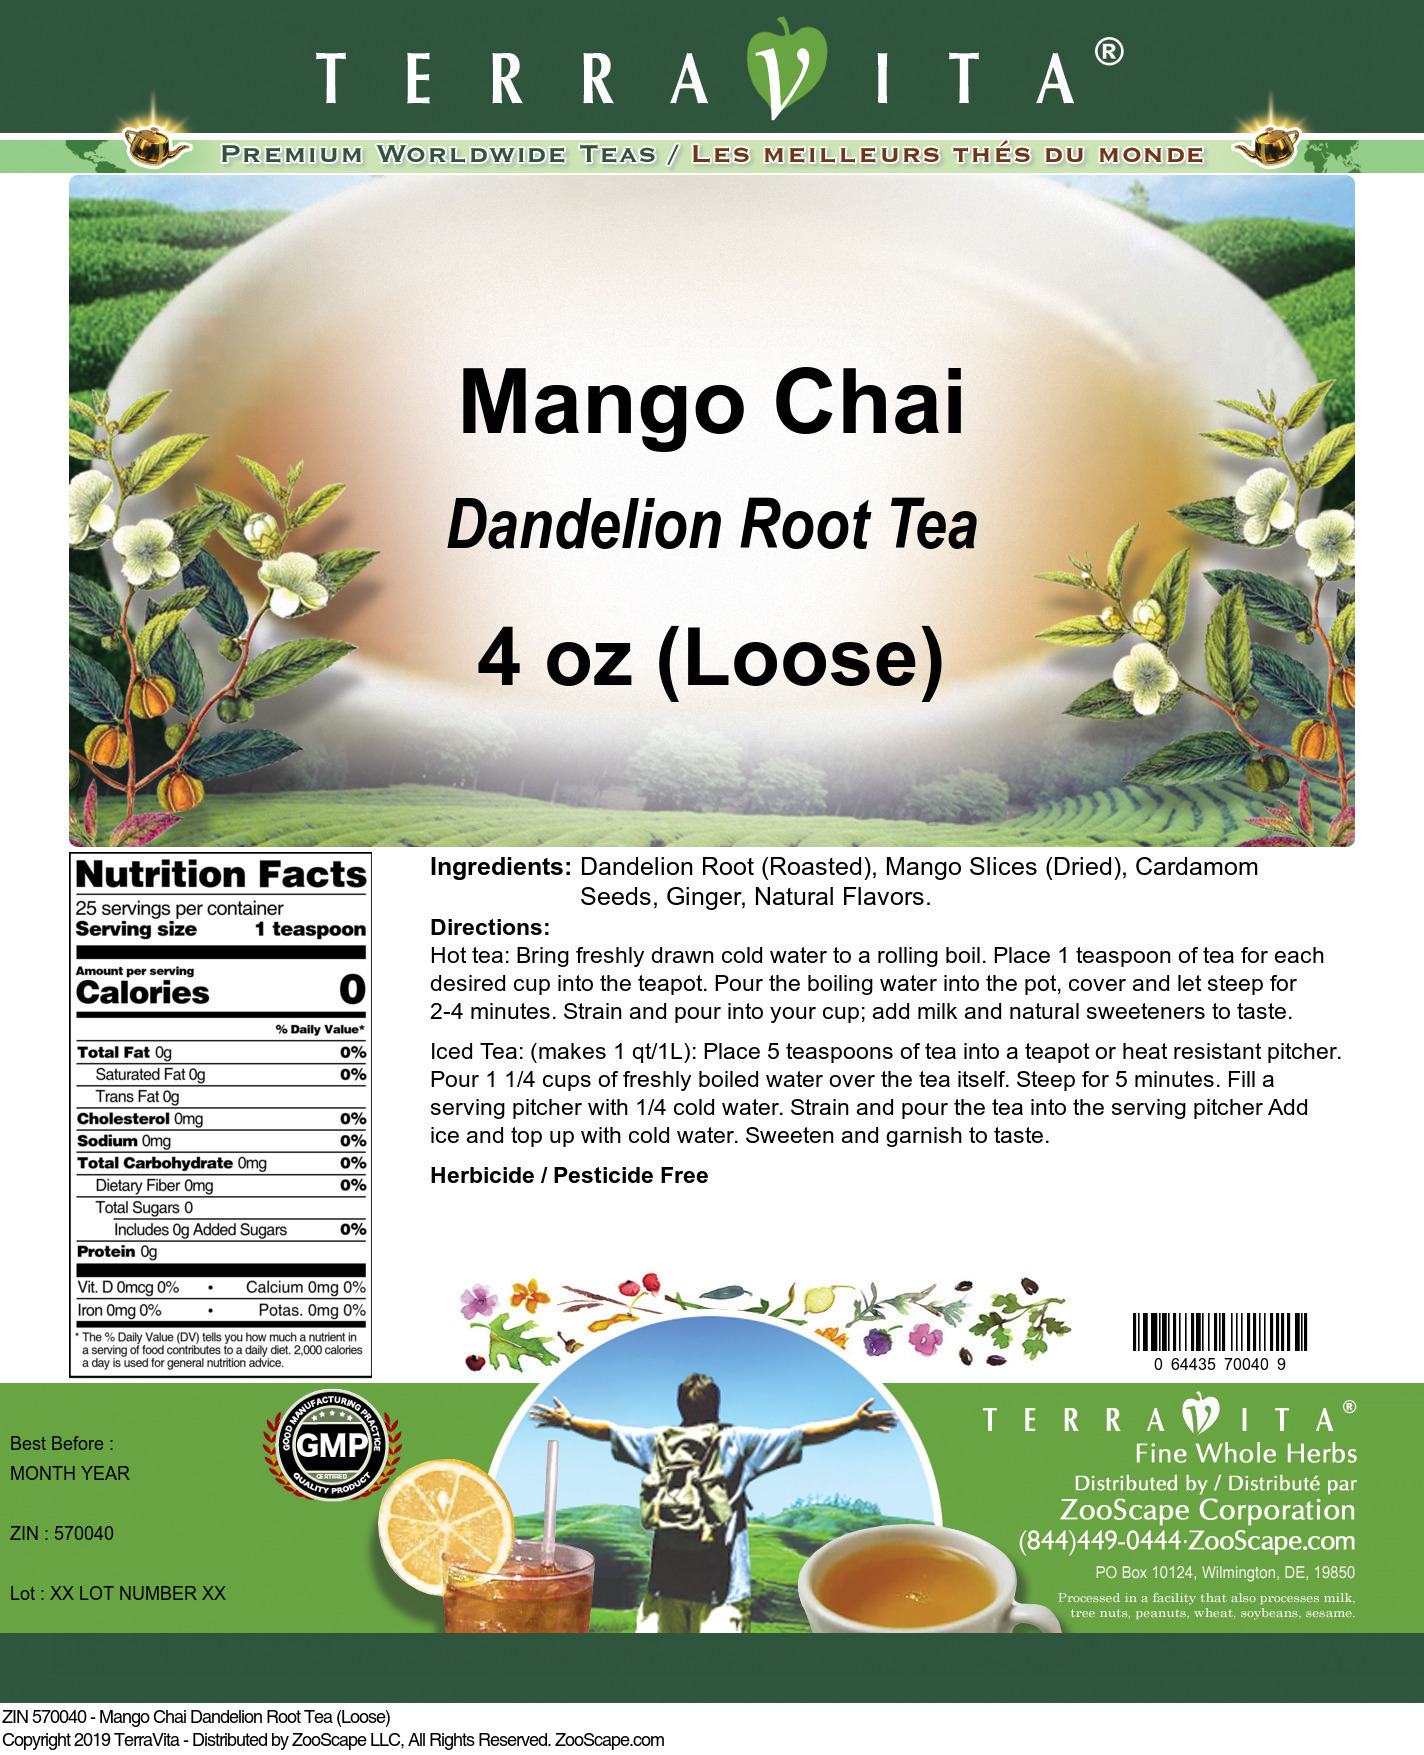 Mango Chai Dandelion Root